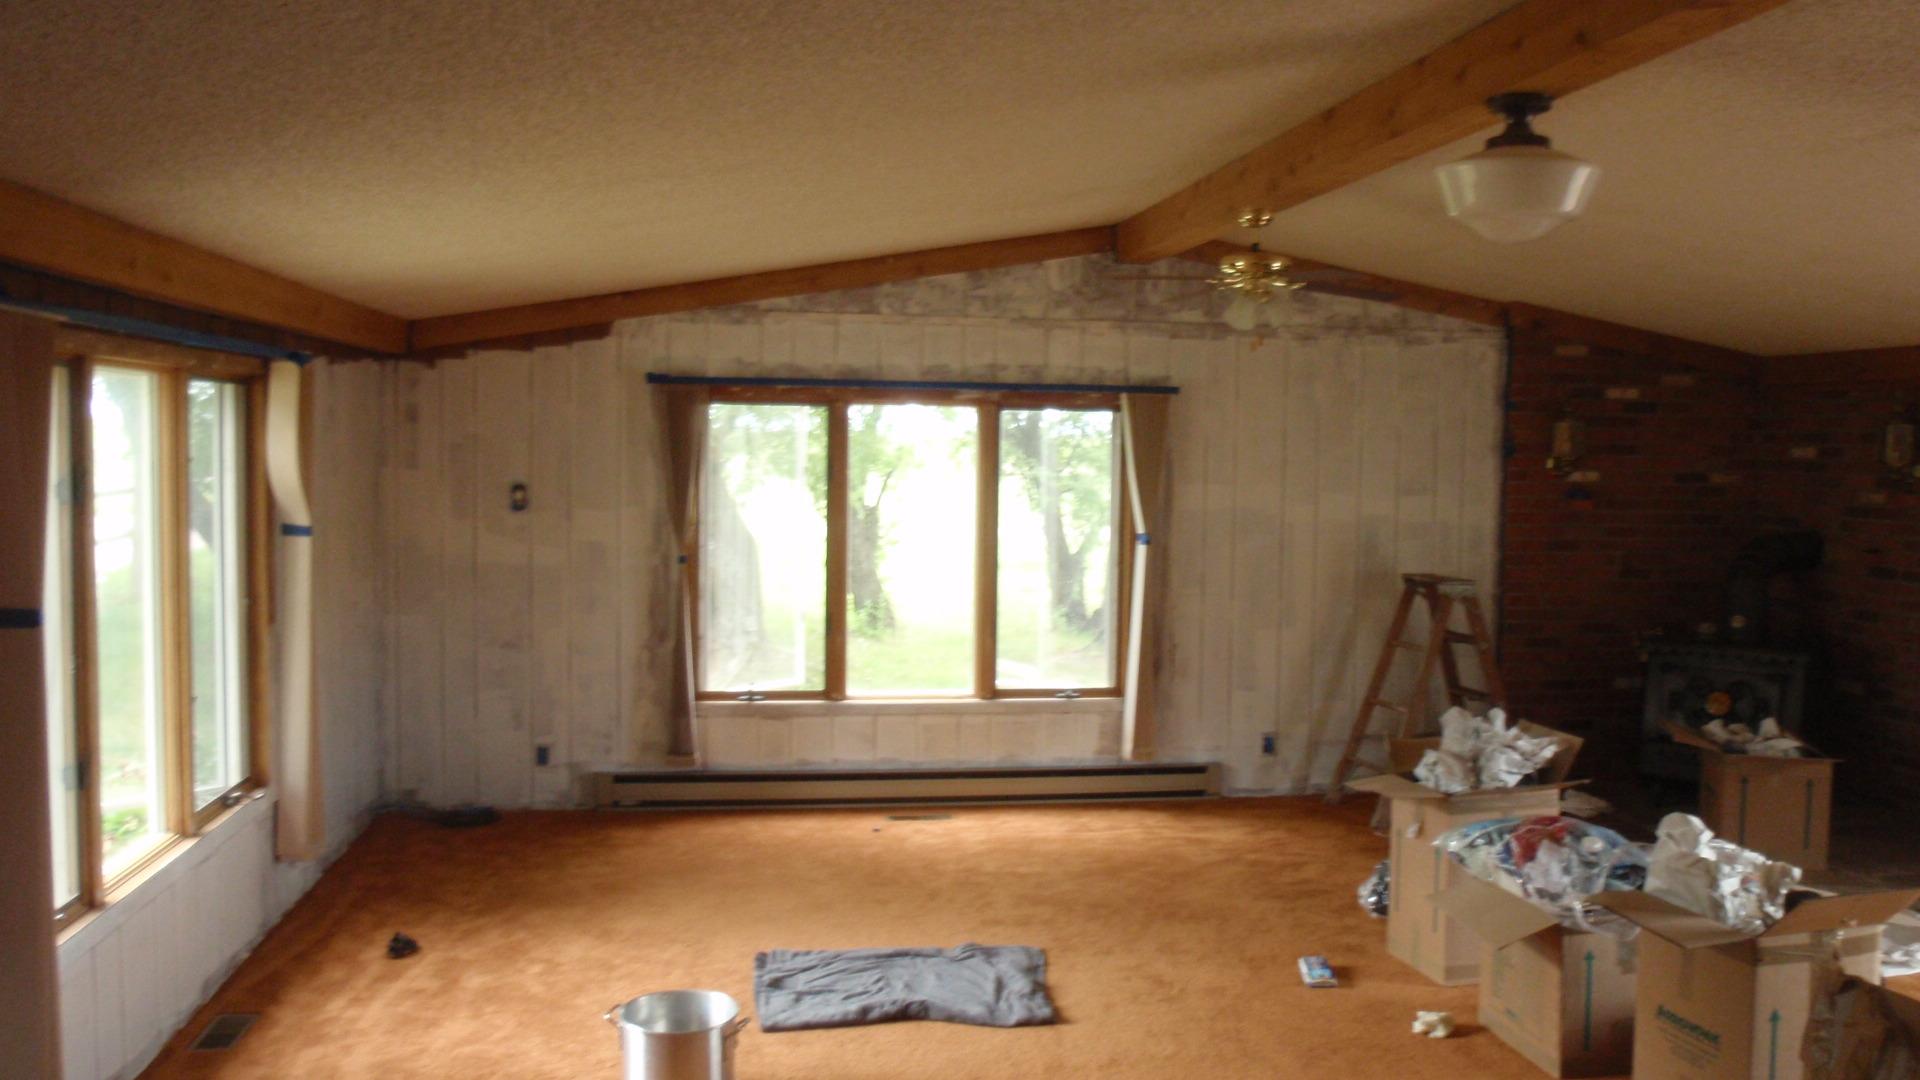 Montana Living Room Renovation My Three C 39 S